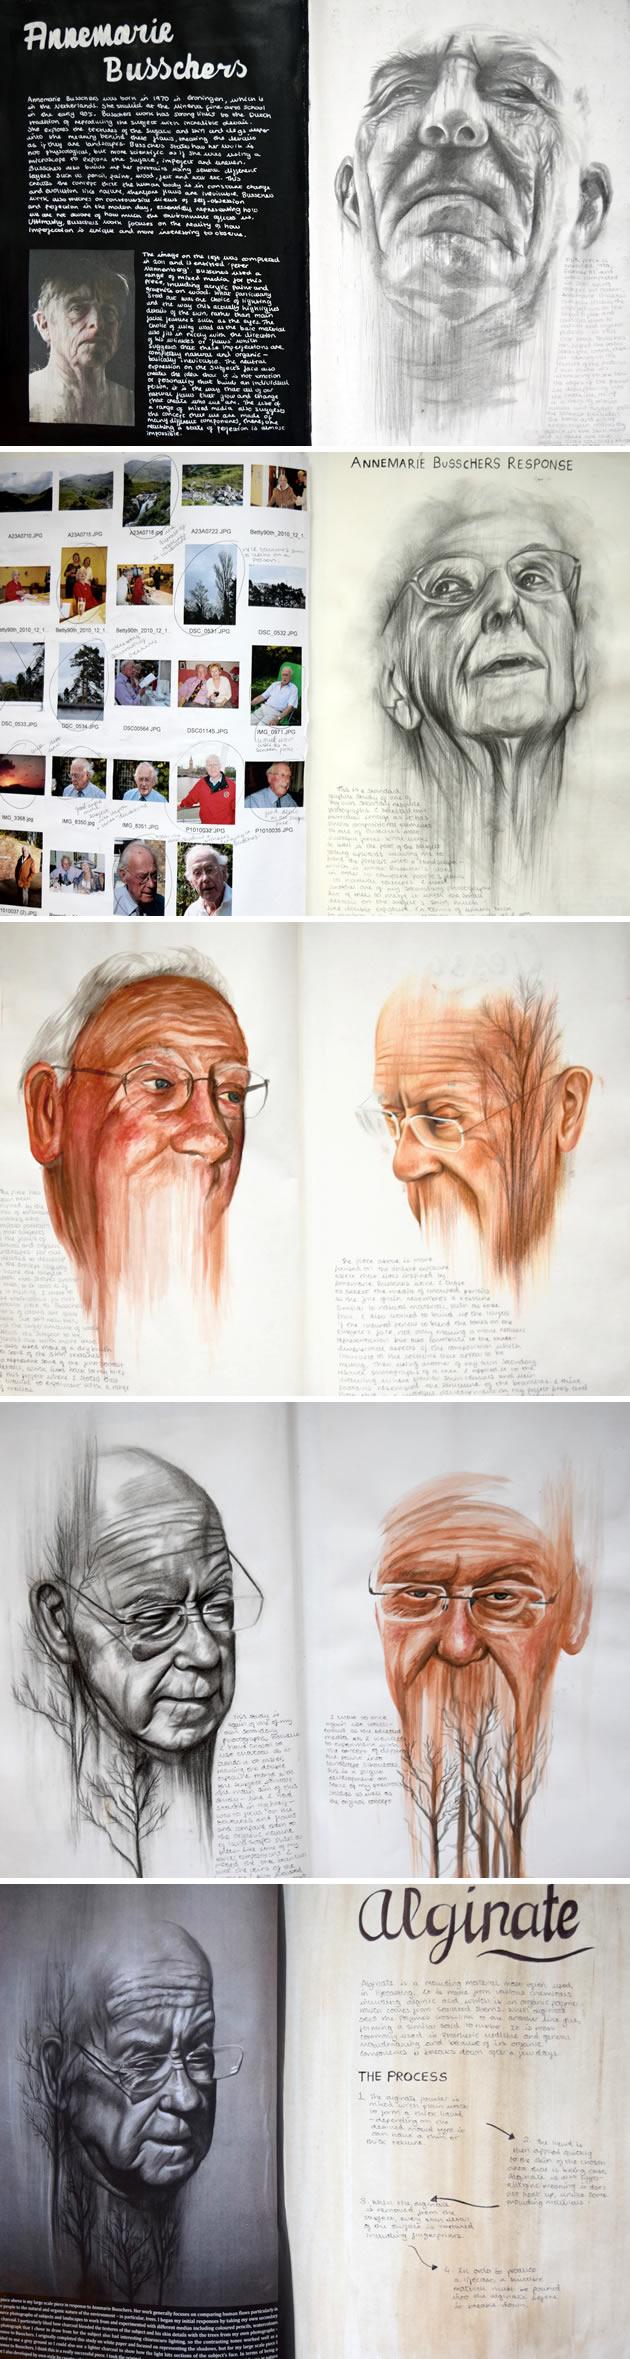 Drawn portrait a level art sketchbook Busschers Level Top Self development